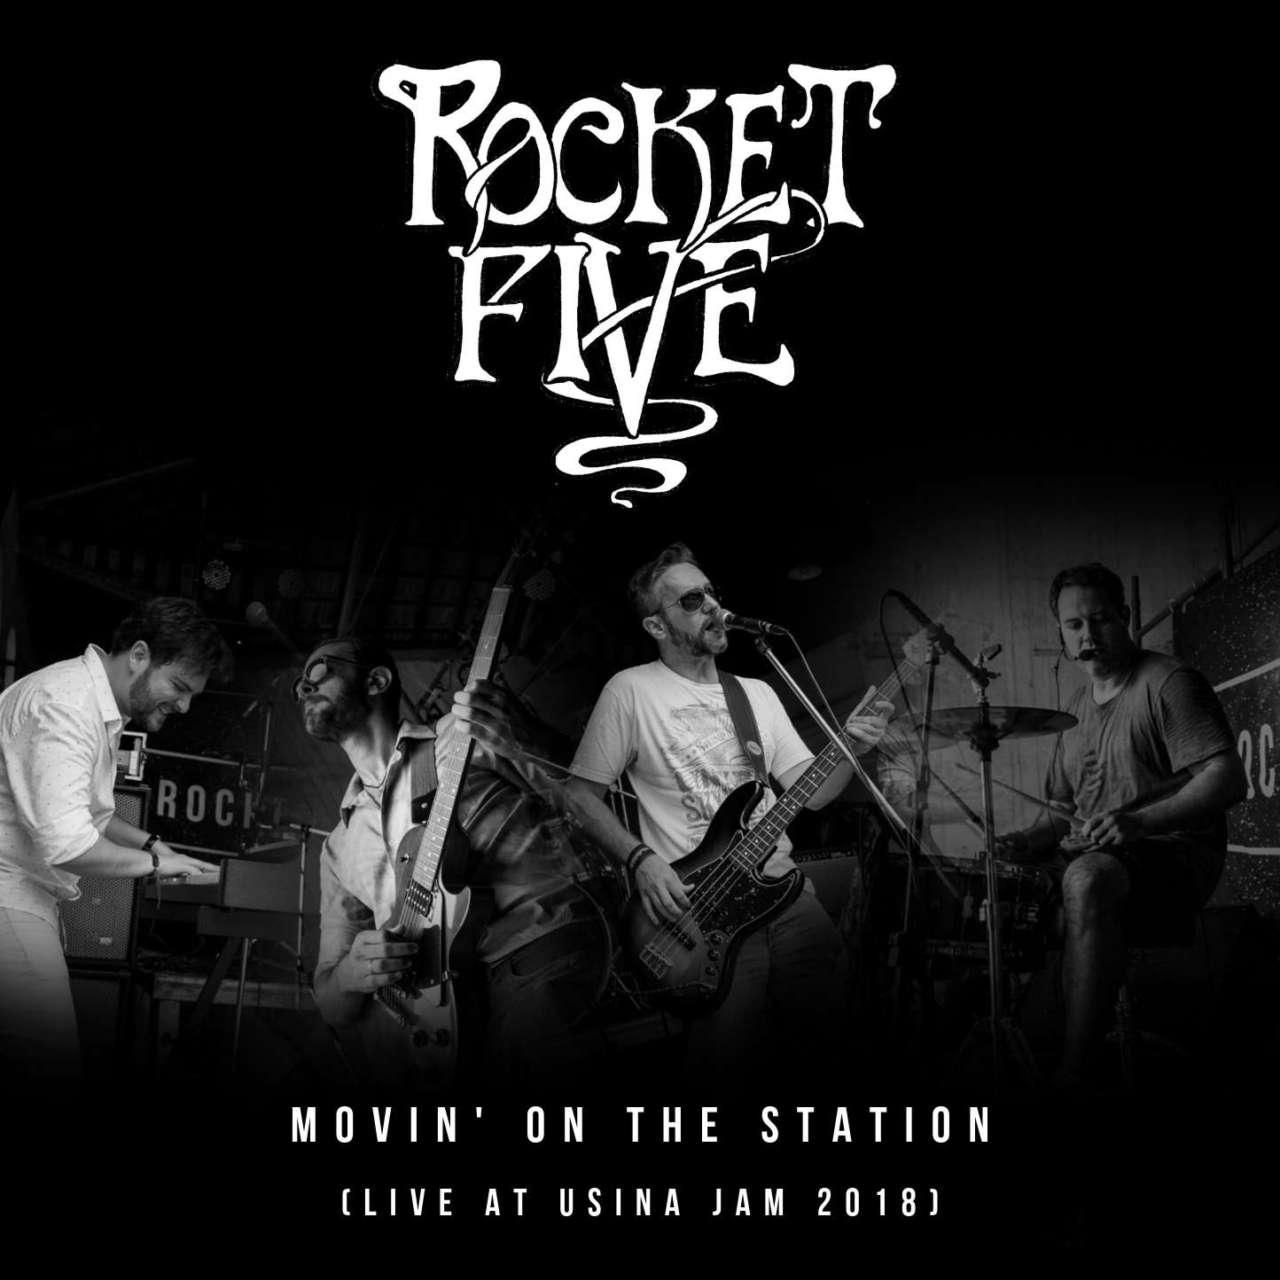 Rocket Five – Movin' On the Station (Live at Usina Jam)